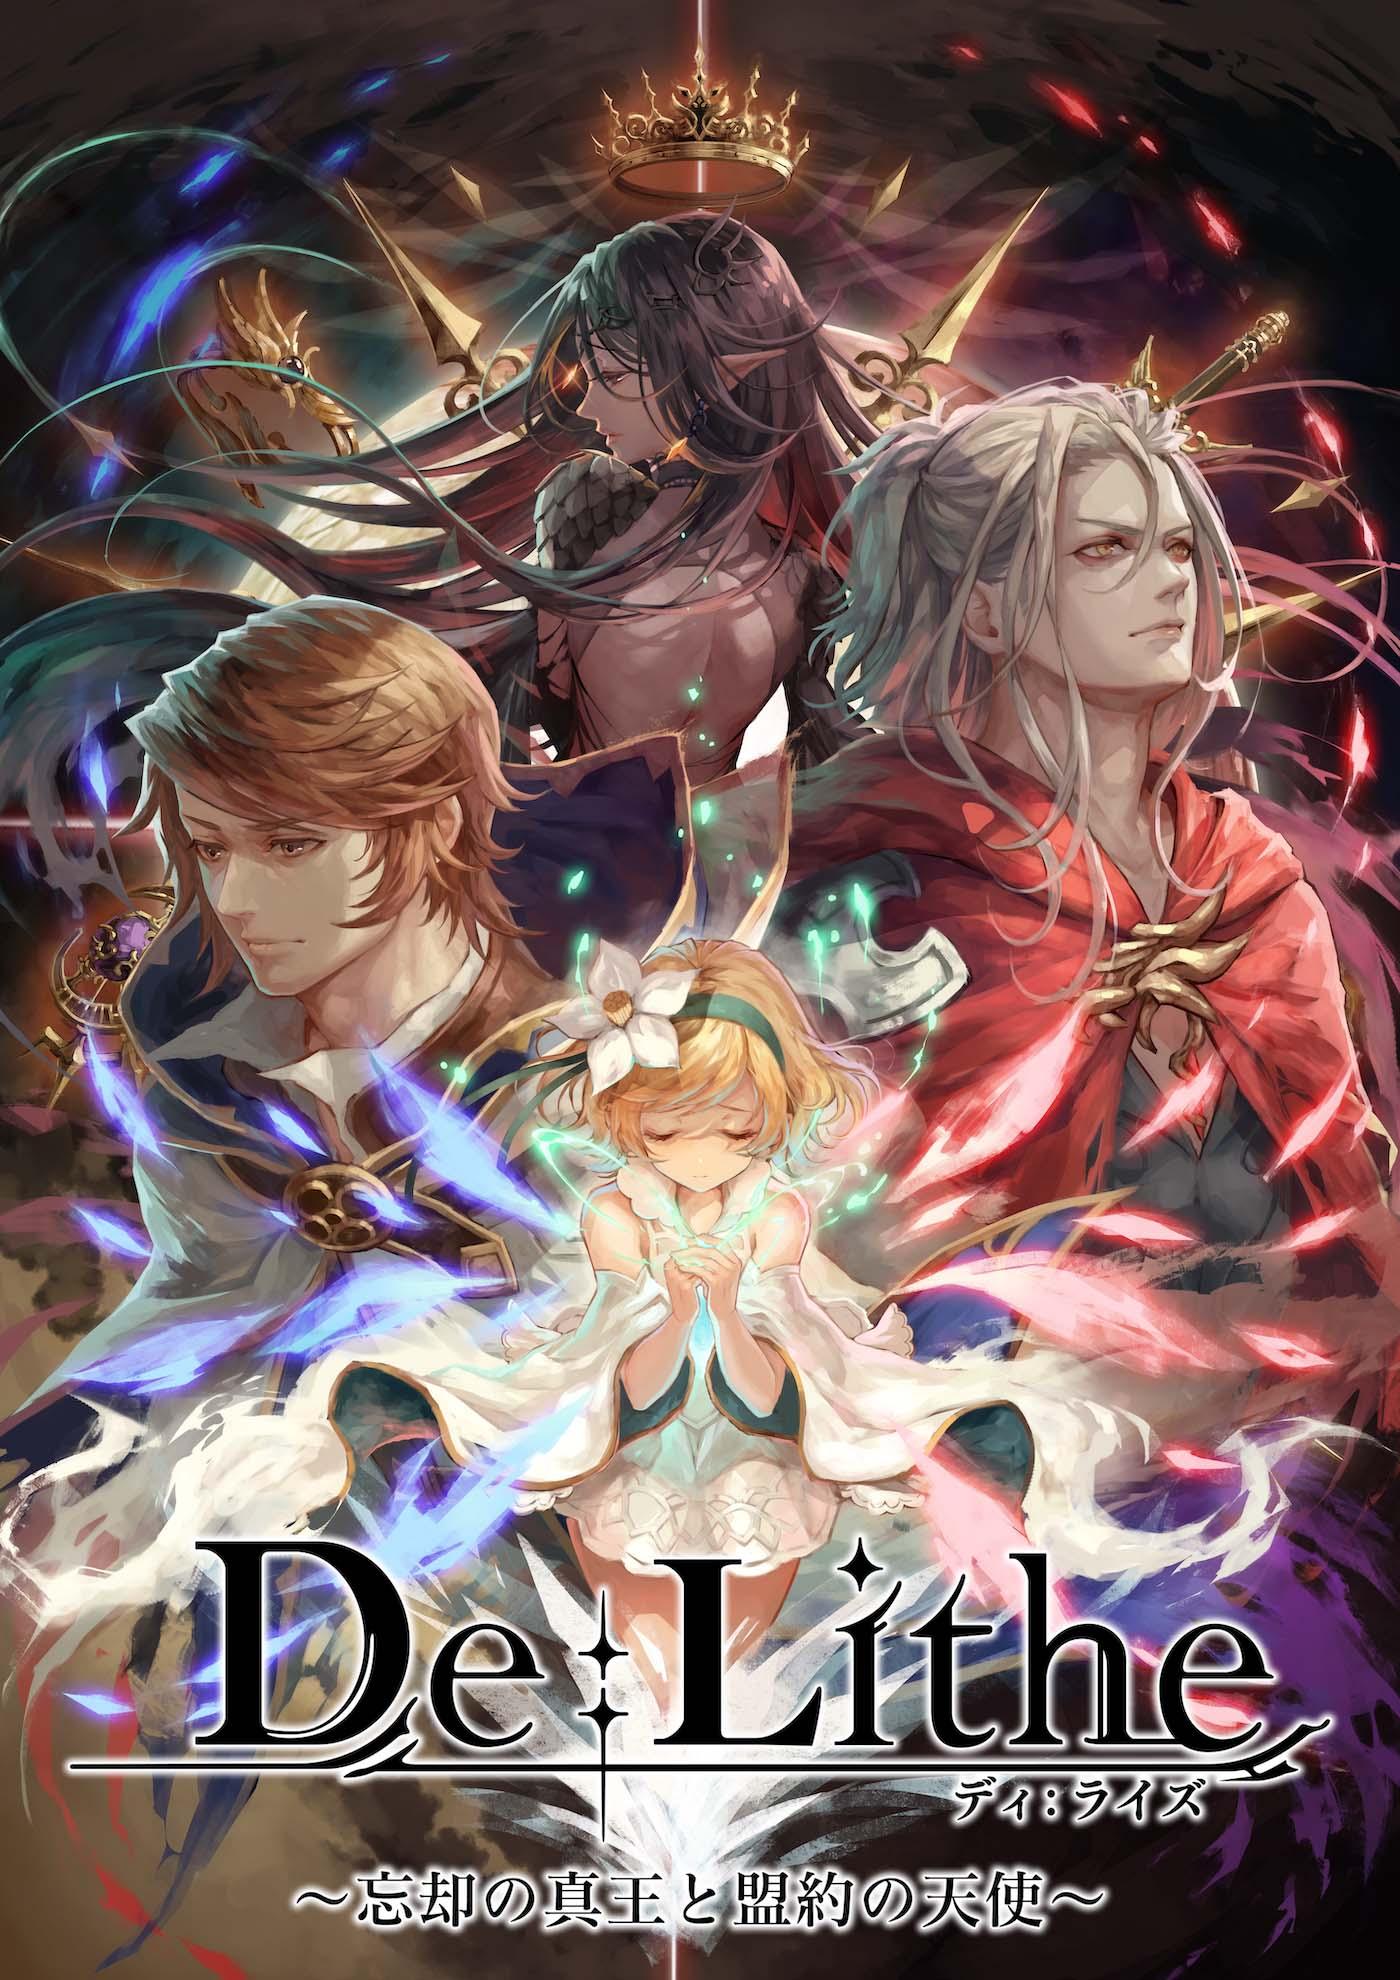 『De:Lithe(ディライズ)』ゲーム情報およびプロモーションムービーを公開!